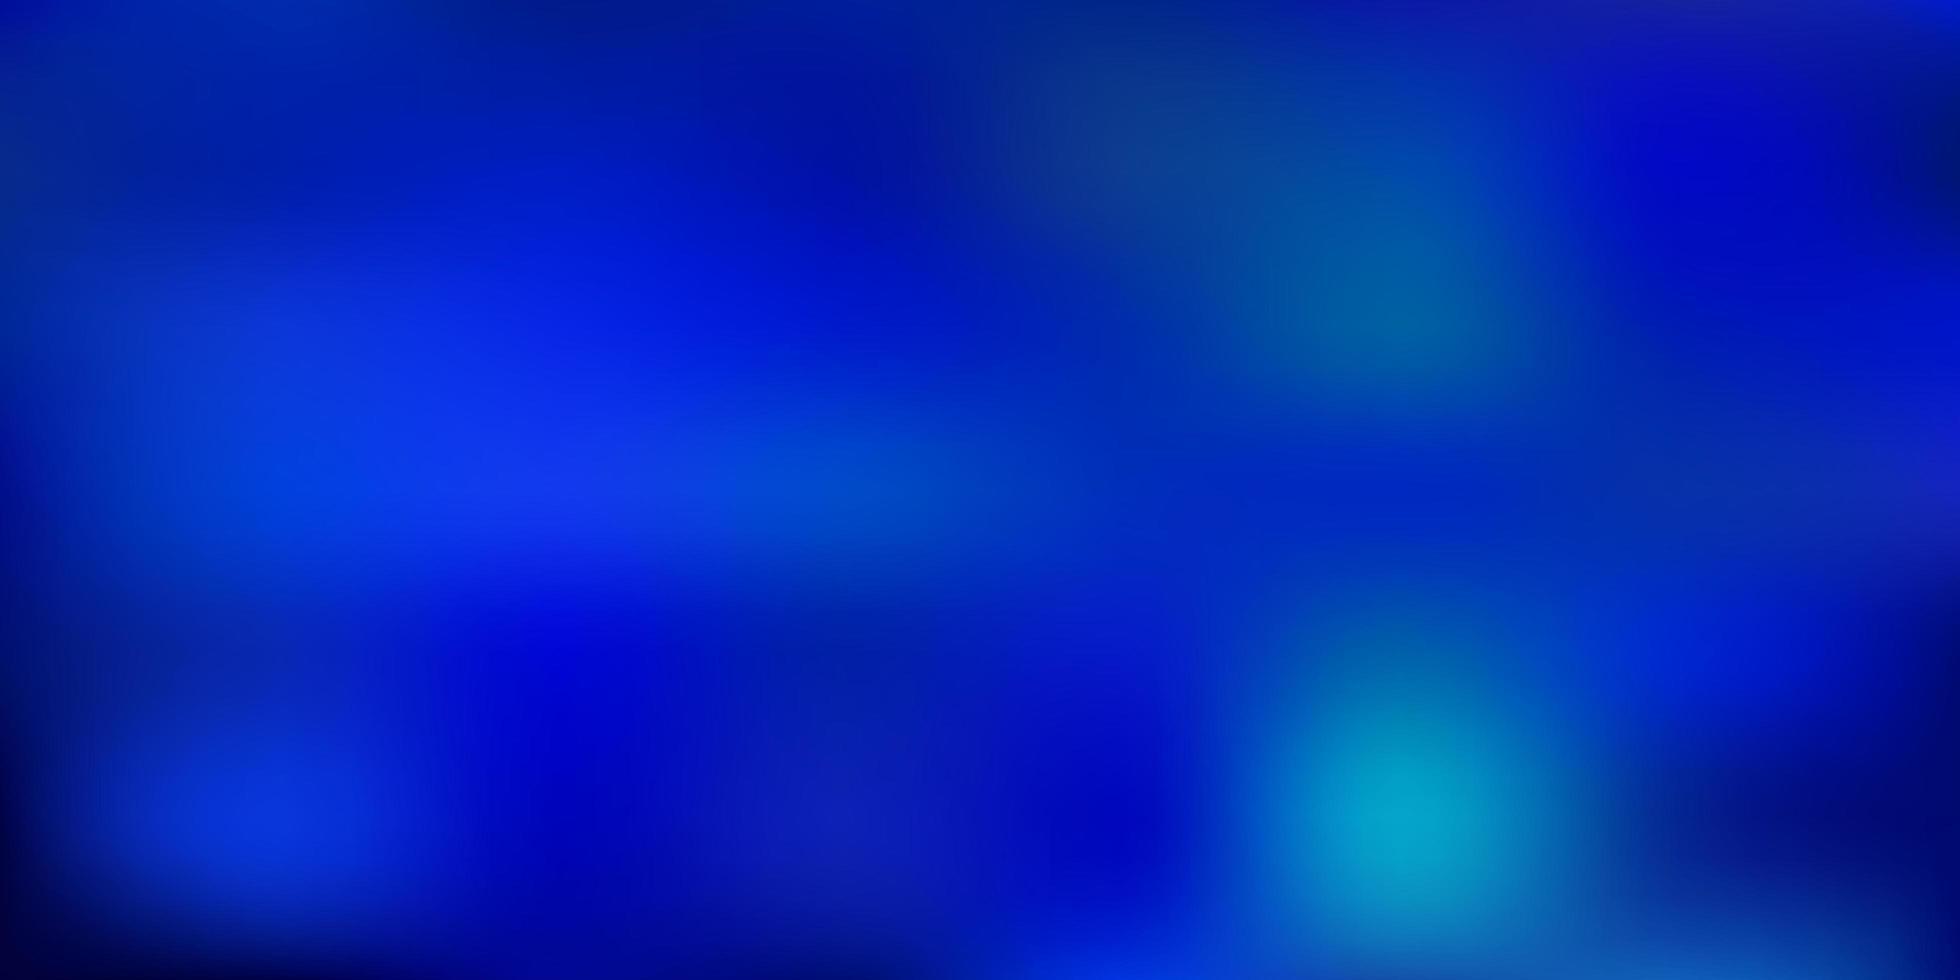 layout sfocatura astratta blu chiaro. vettore